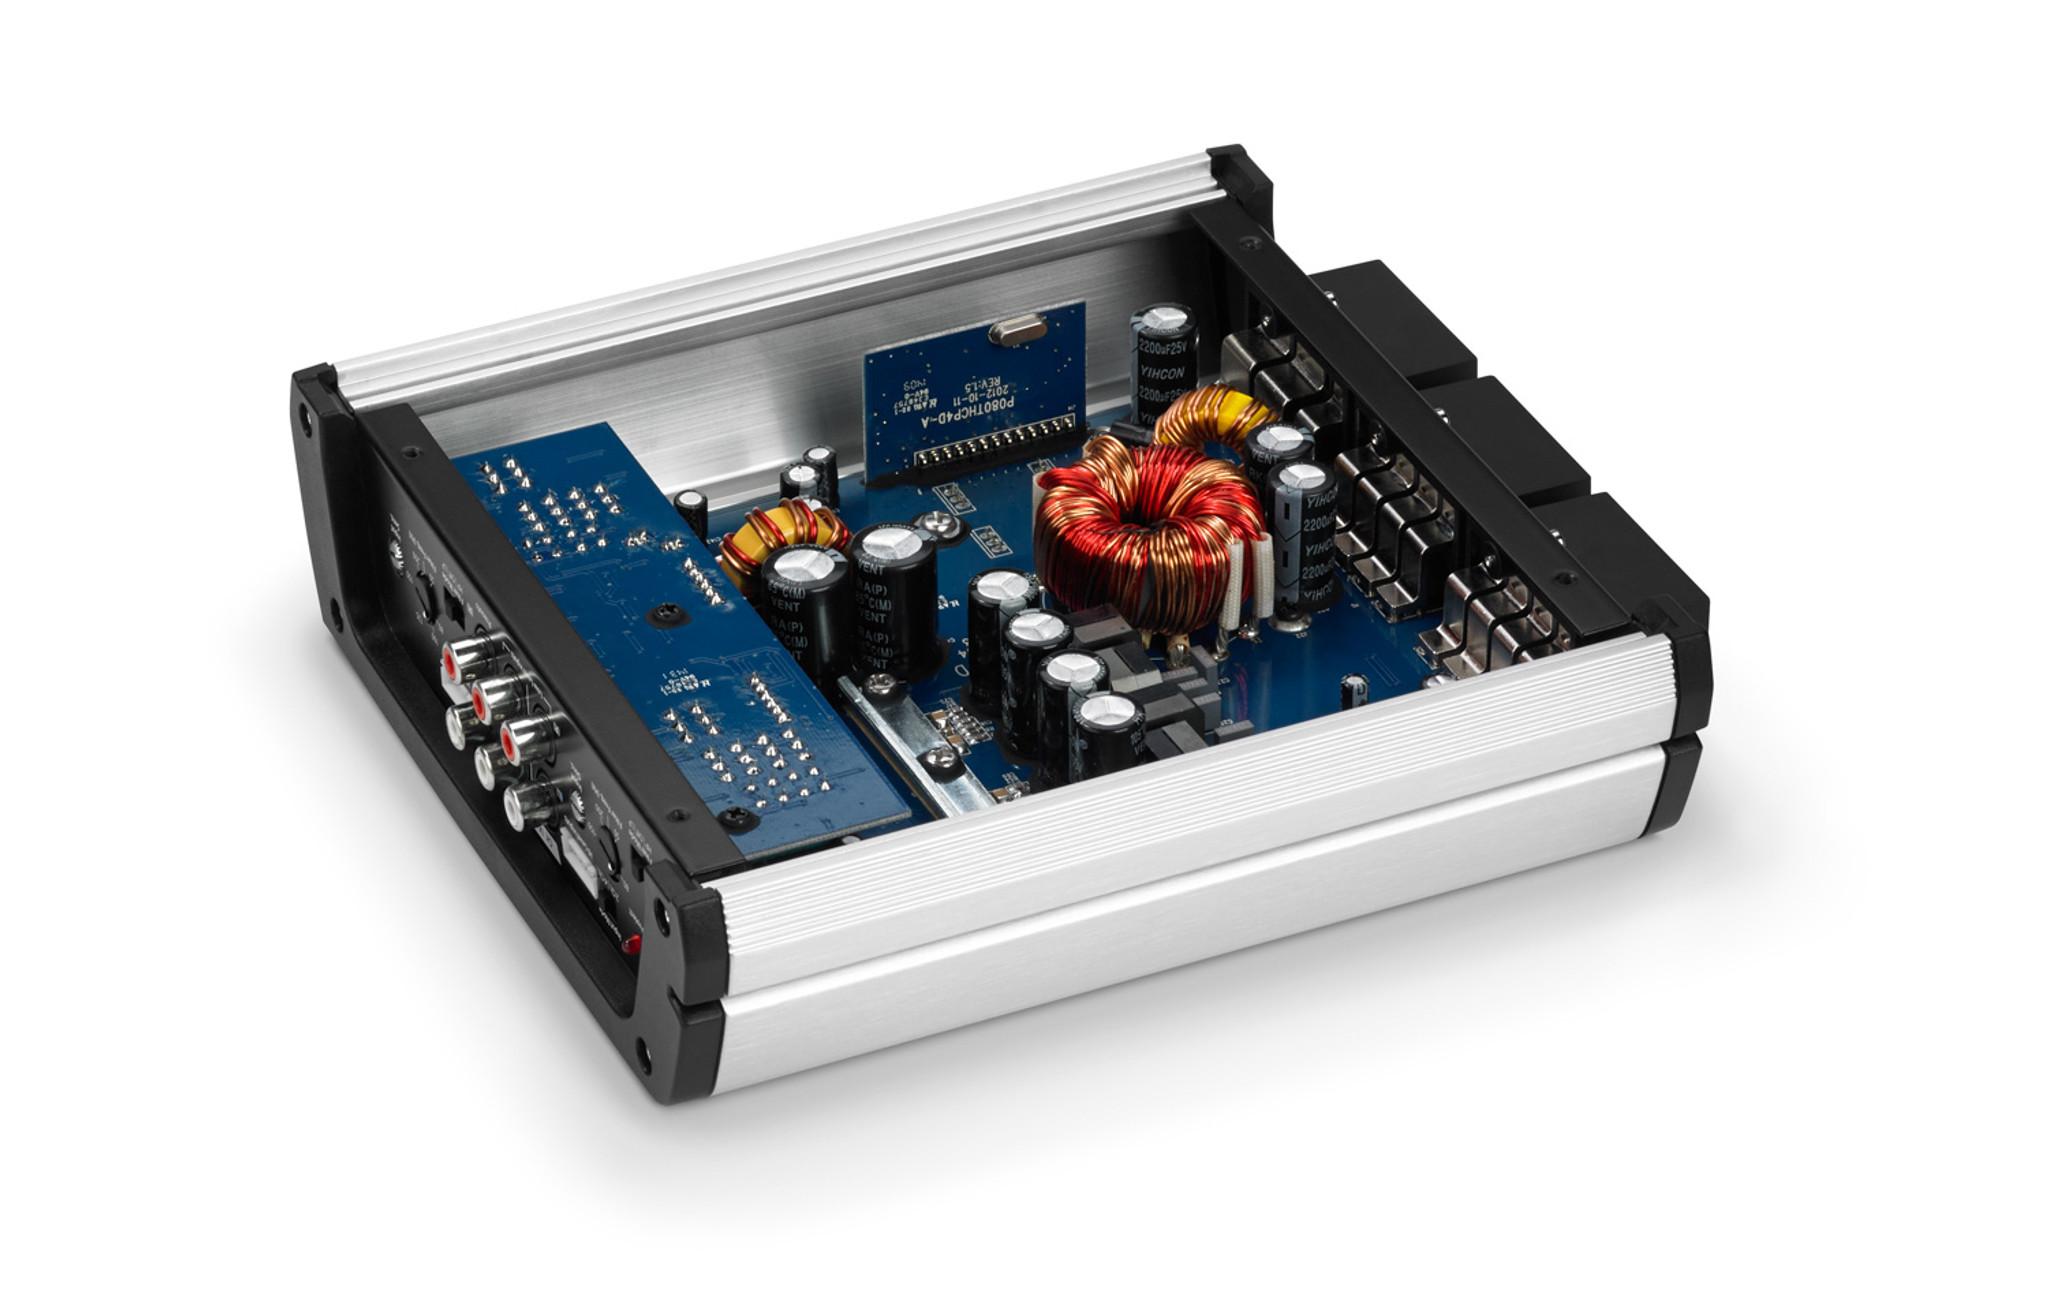 JL Audio JX400/4D 4-channel Class D full-range amplifier